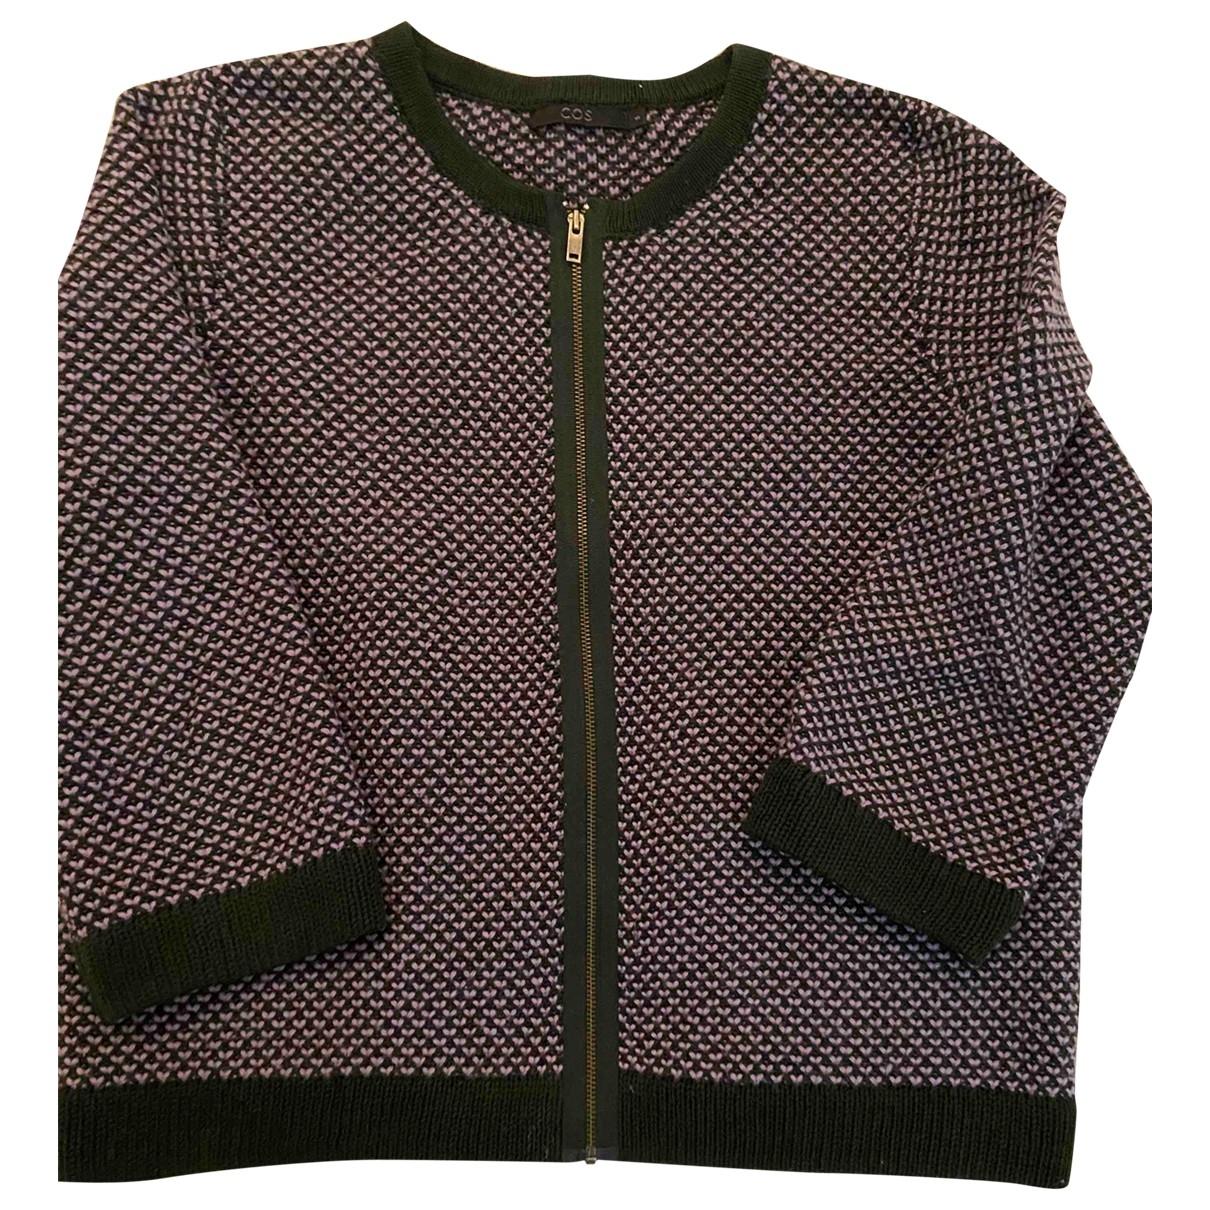 & Stories \N Multicolour Cotton Knitwear for Women 38 FR